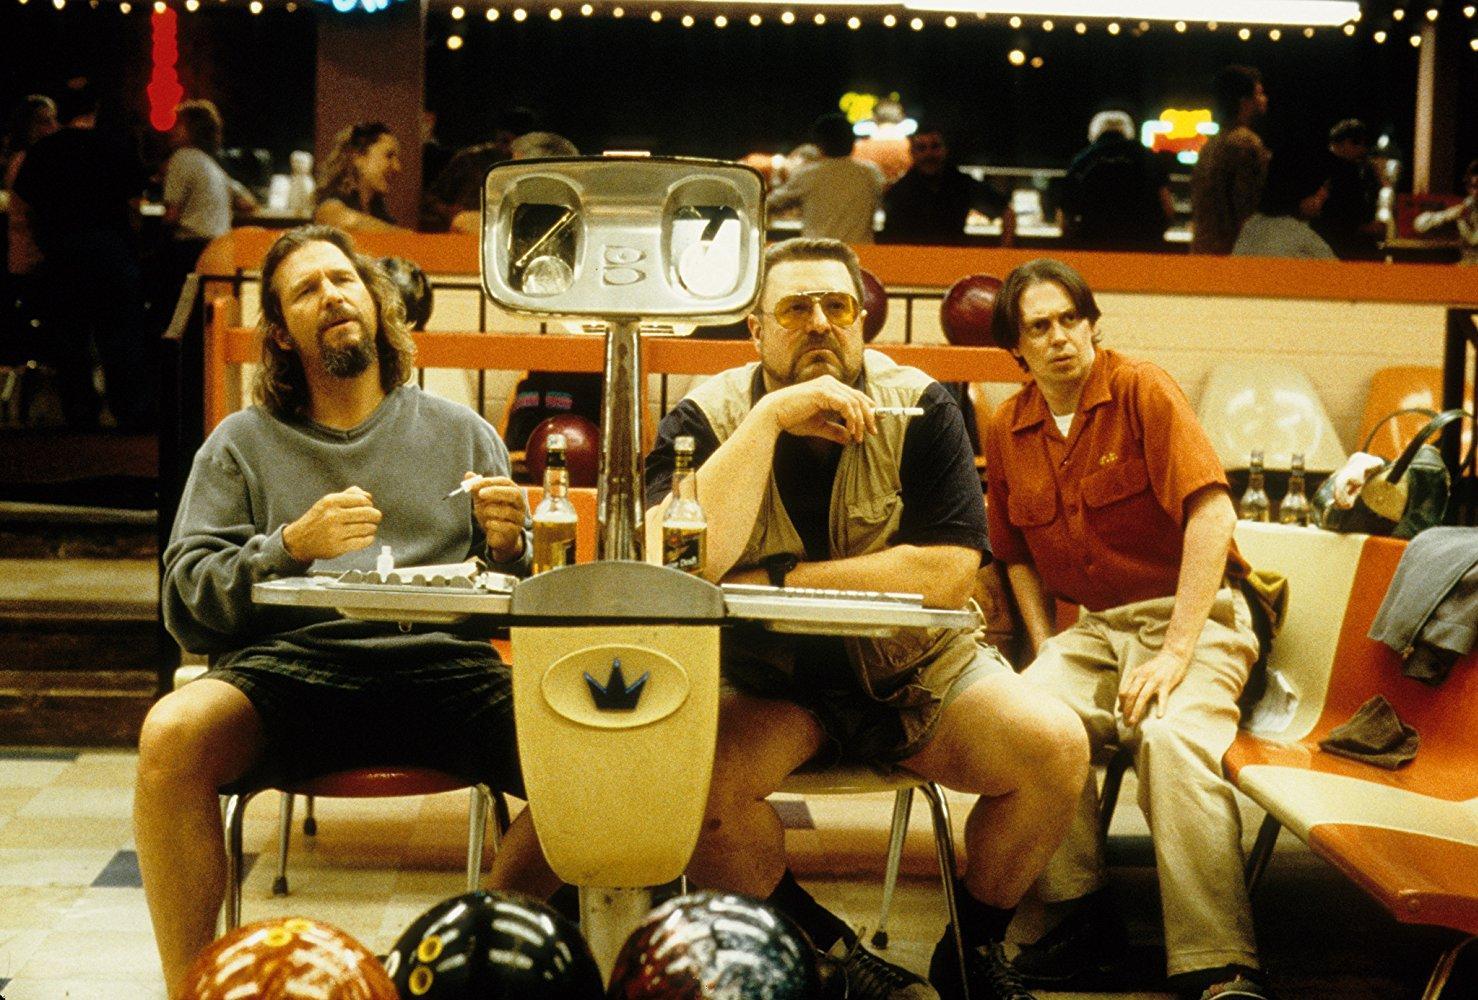 big-lebowski-bowling-1548351810450.jpg